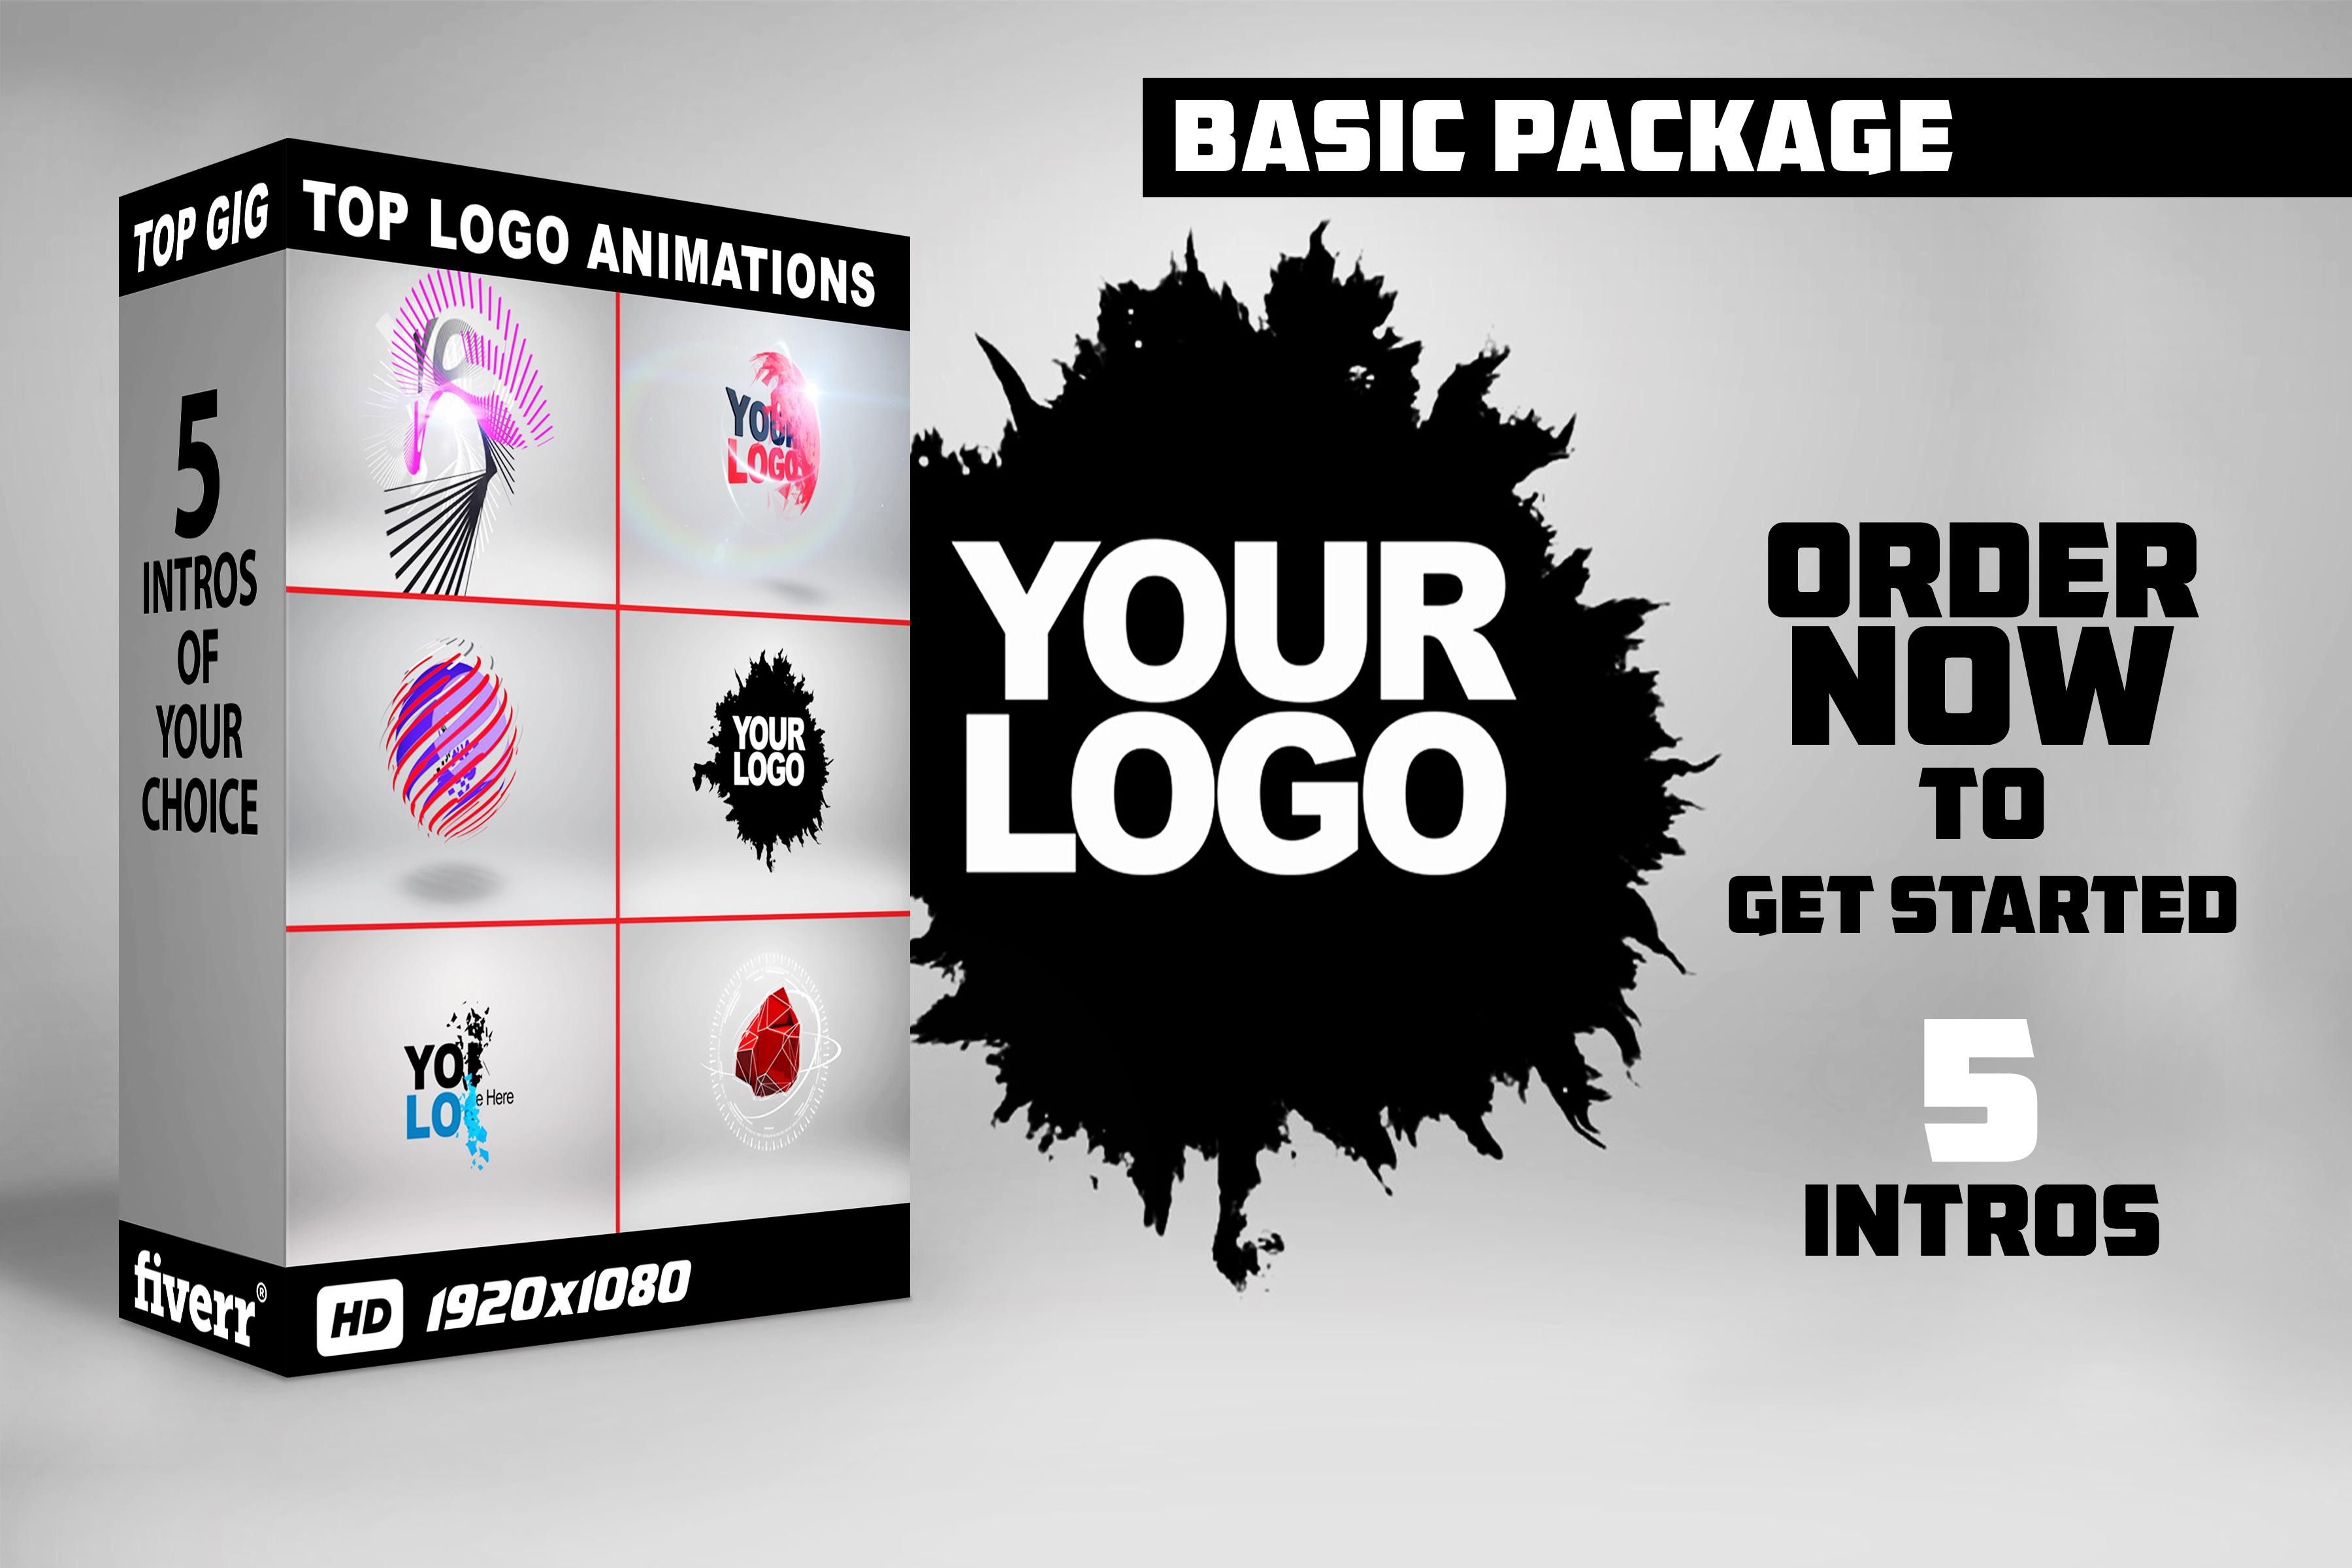 Create 5 Swesome Animated Logo Intros